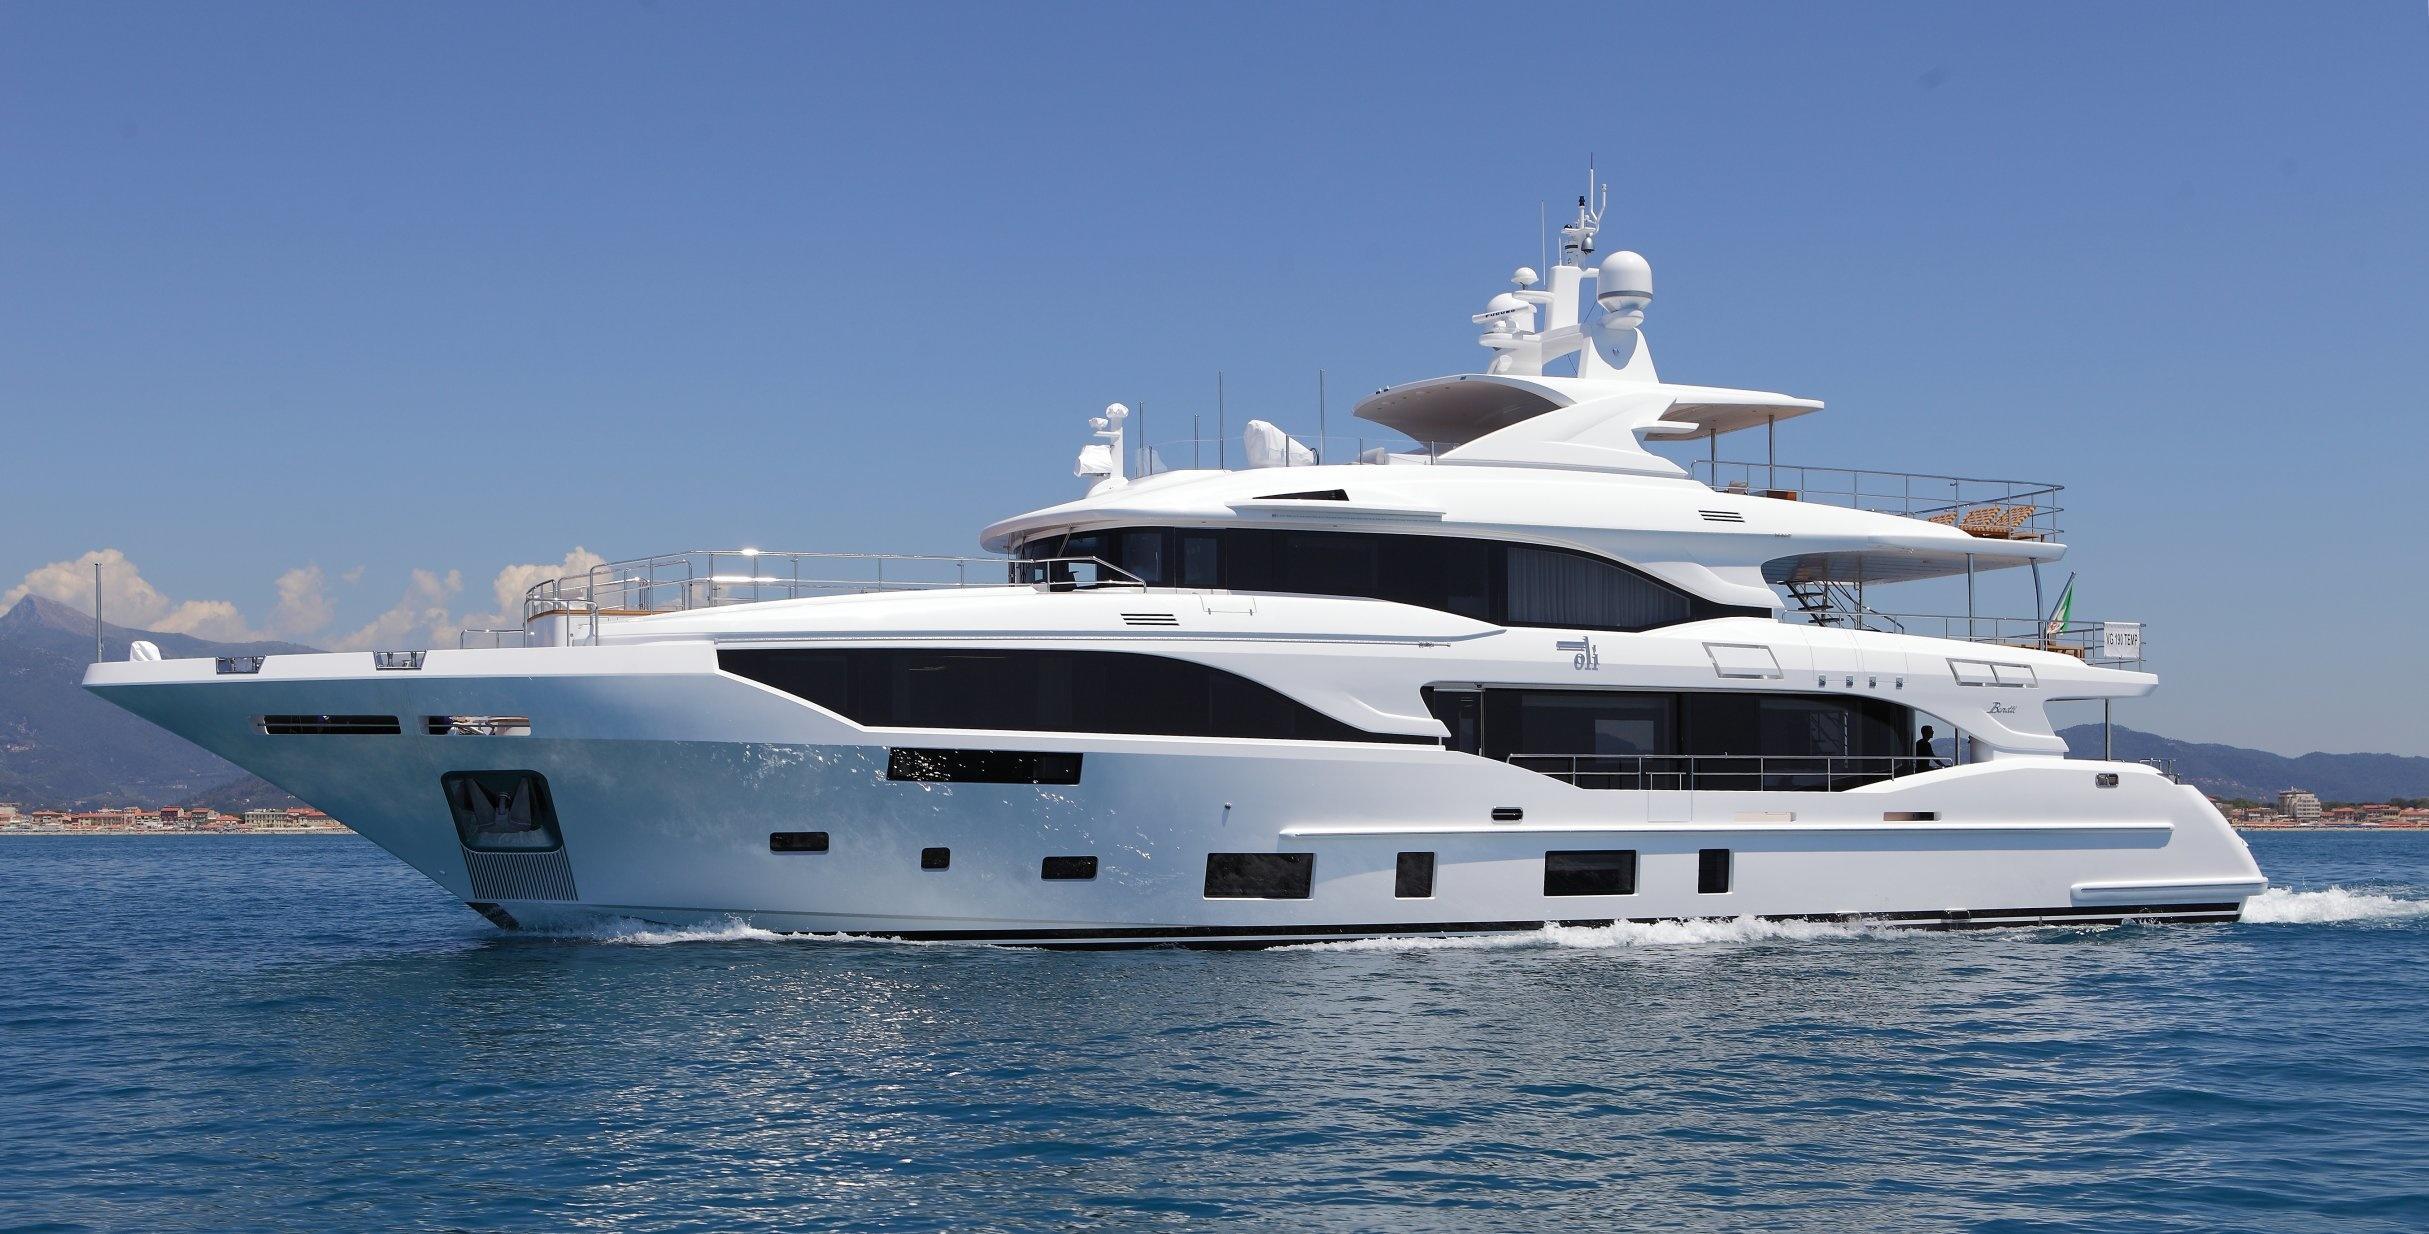 17511-benetti-launches-first-mediterraneo-116-motor-yacht